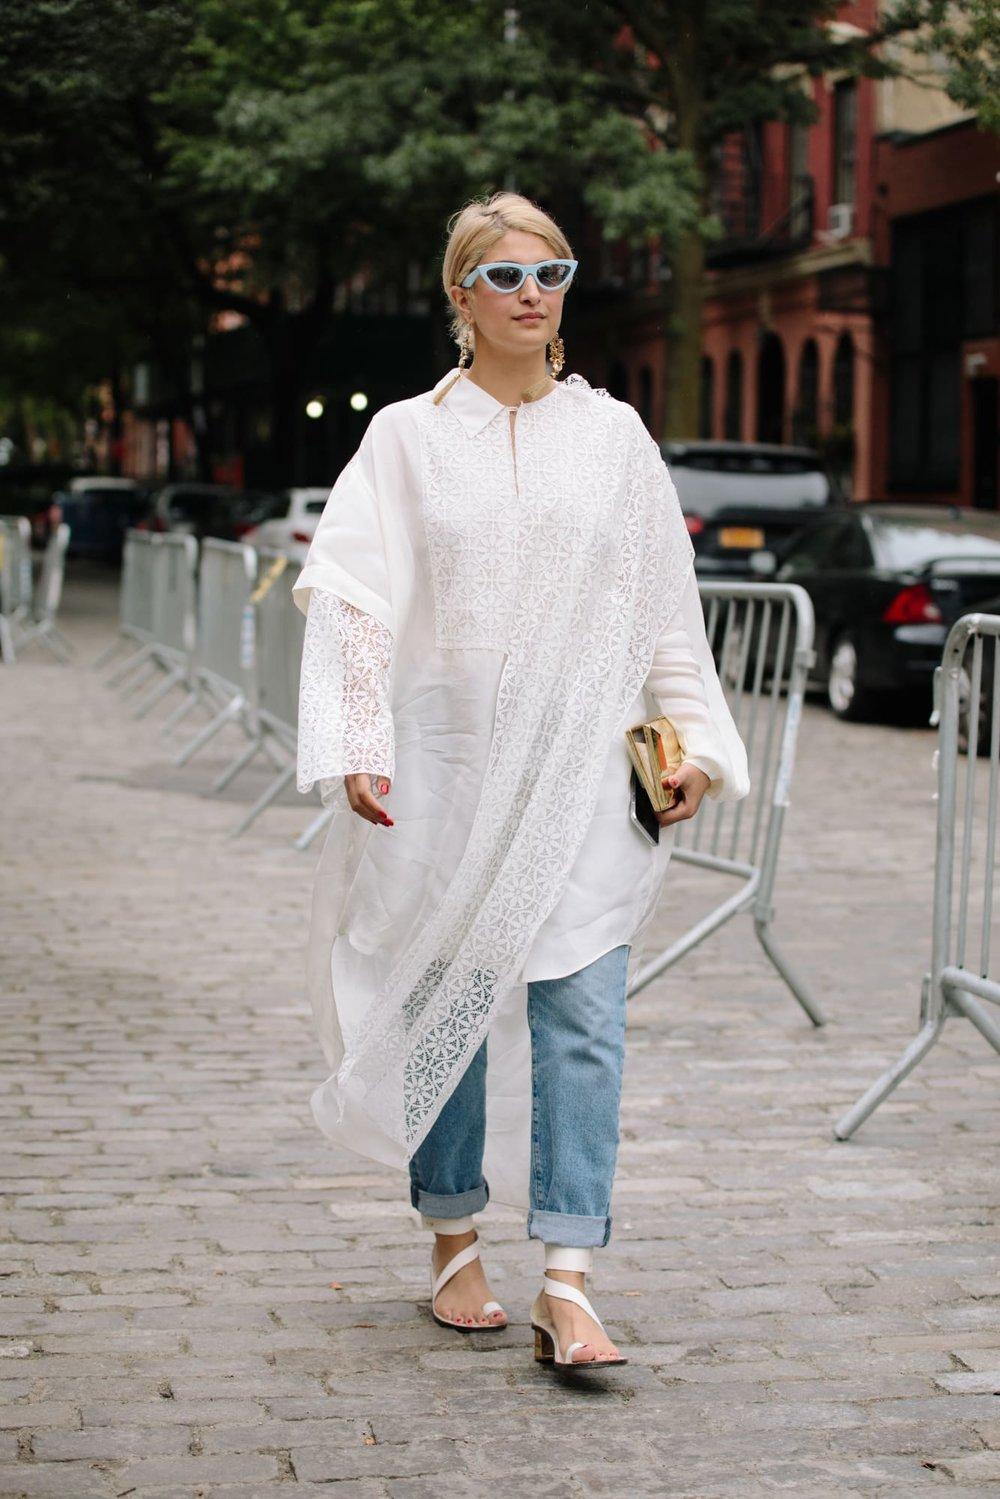 new-york-fashion-week-street-style-spring-2019-day-3-12.jpg